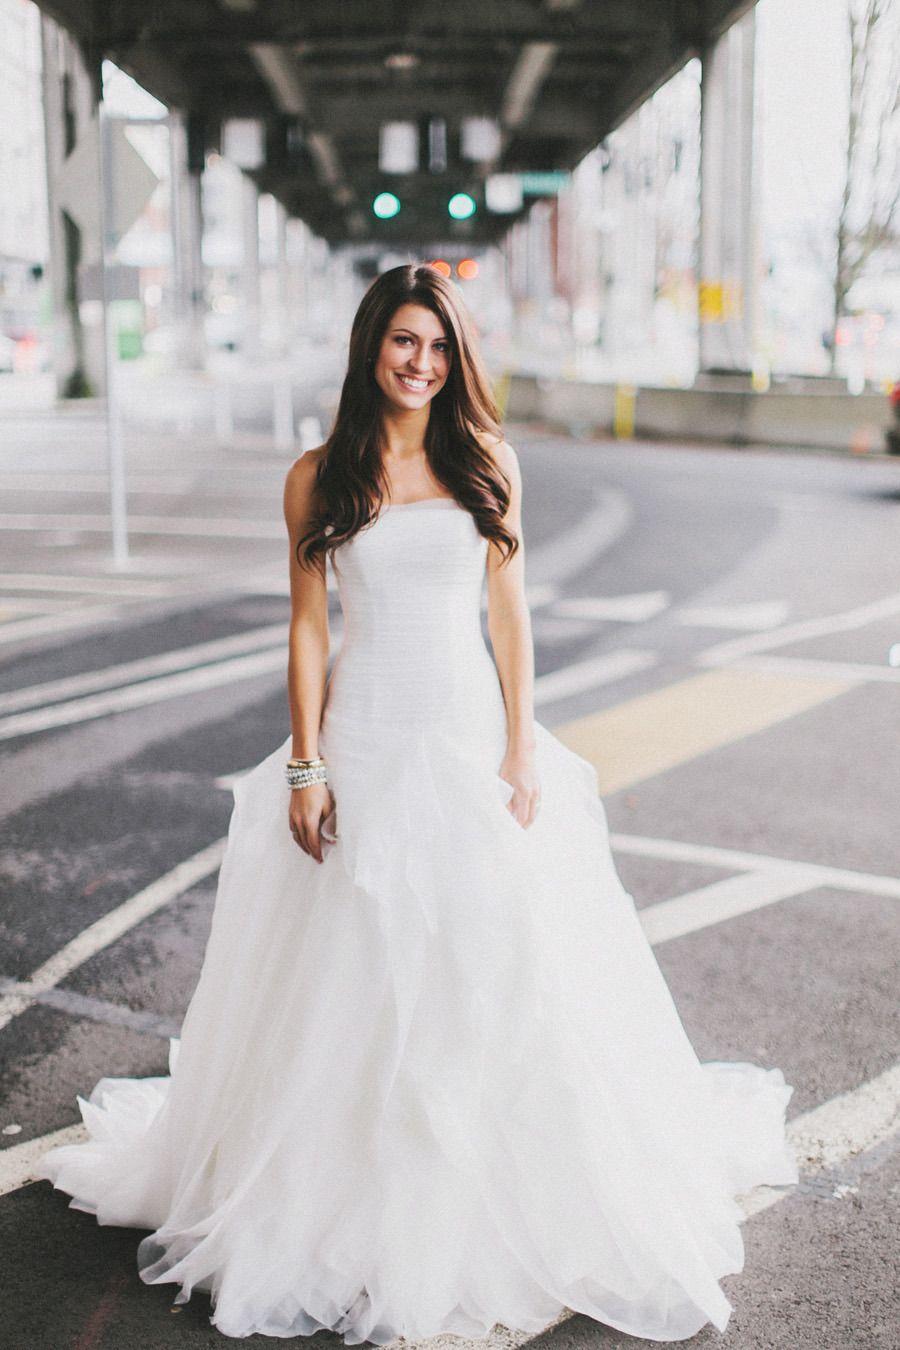 Urban Seattle Holiday Wedding | Wedding, Weddings and Wedding dress